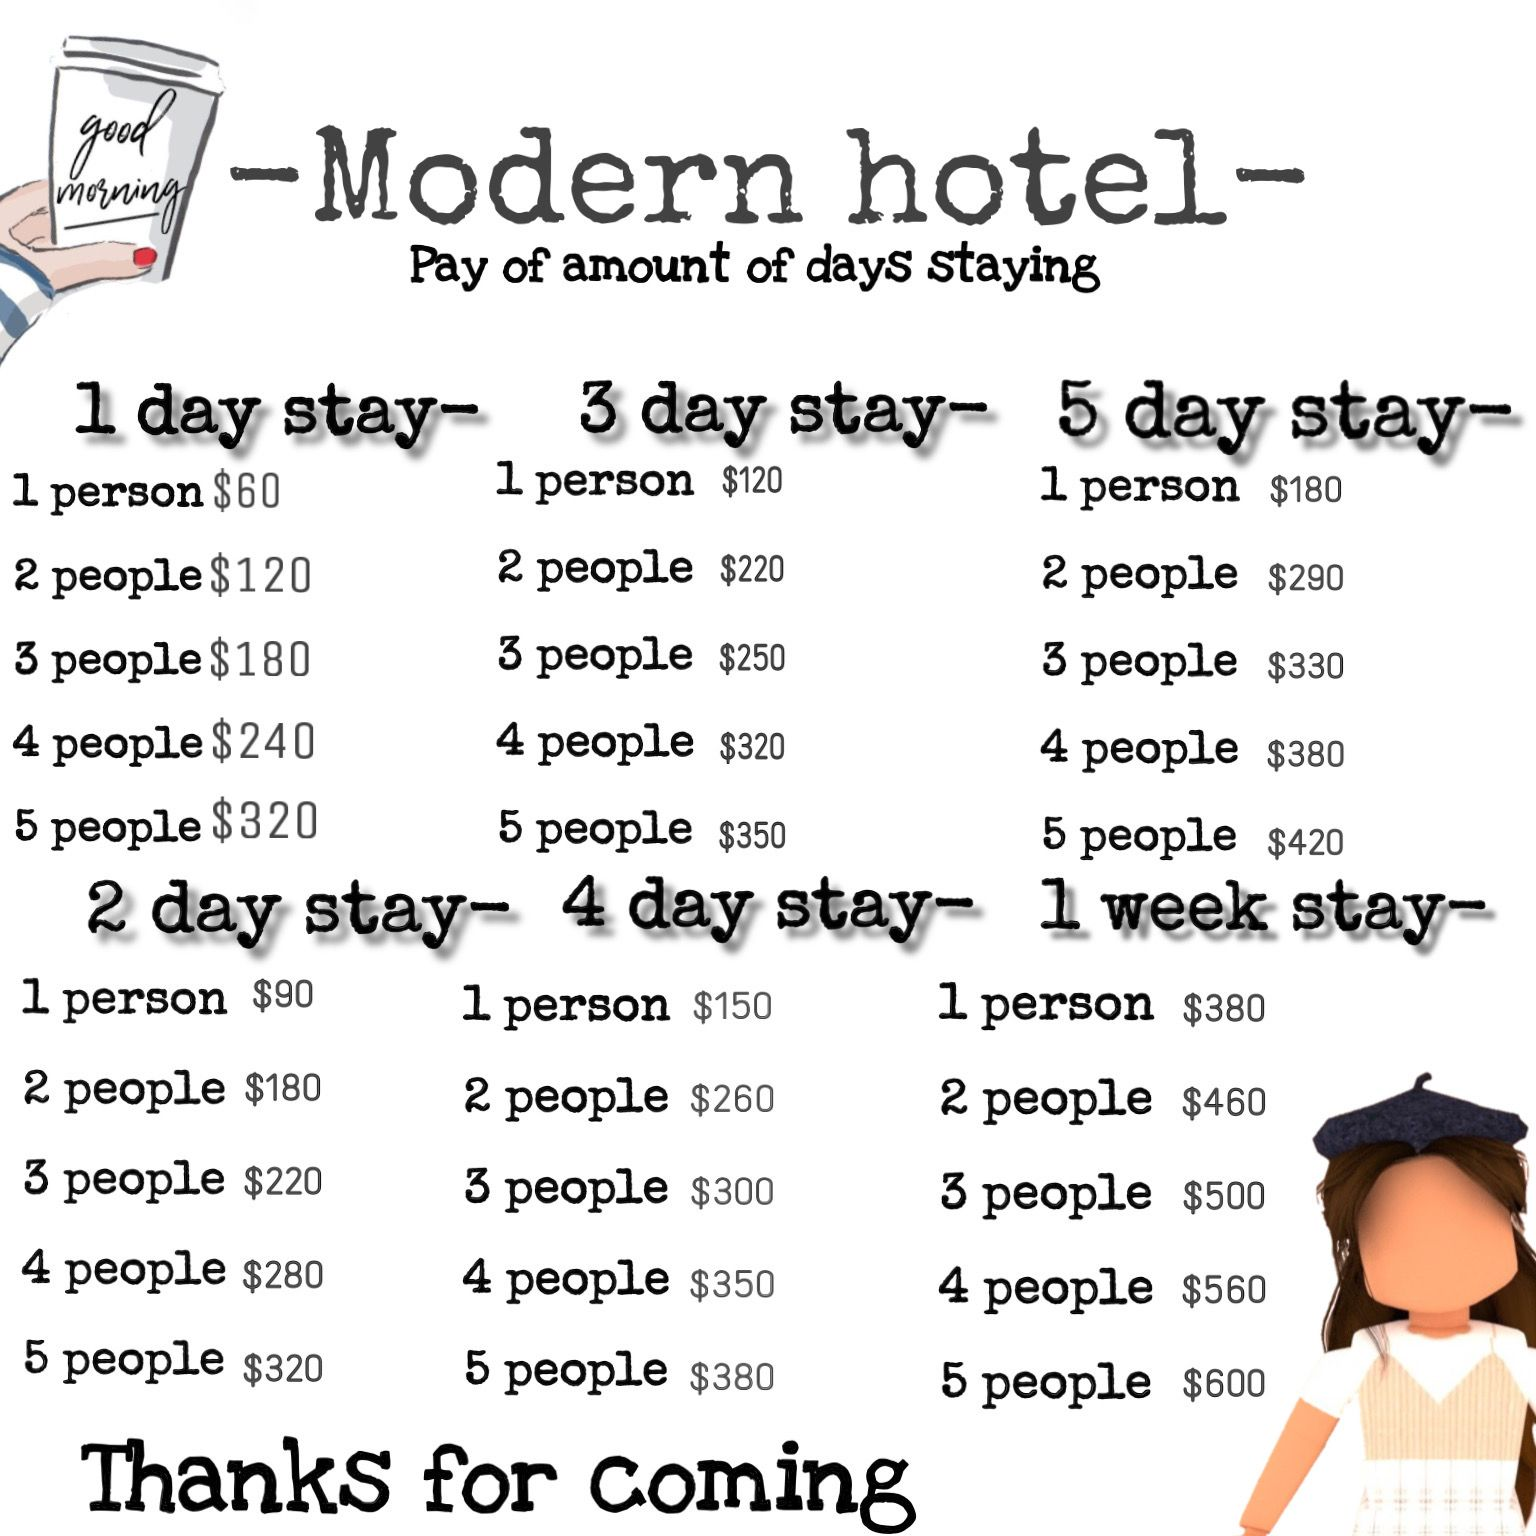 Modern Hotel Menu Decal In 2020 Roblox Pictures Custom Decals Decal Design